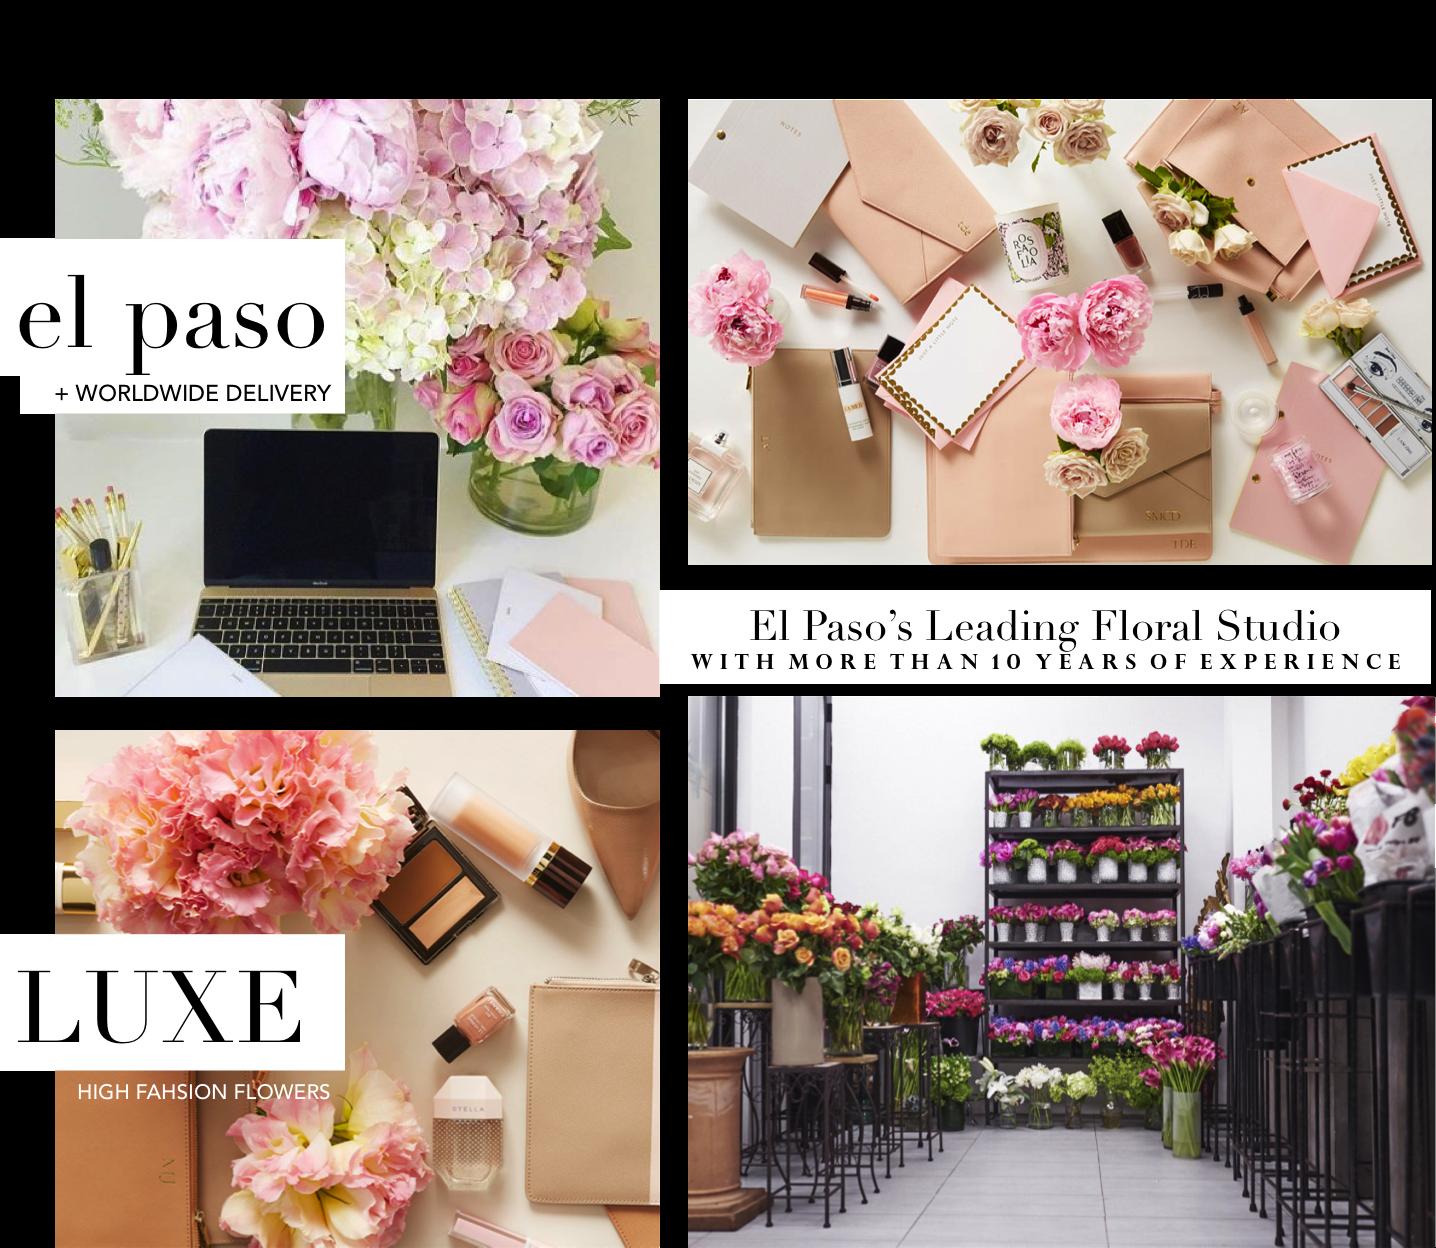 0-angies-floral-designs-915-el-paso-texas-79912-angies-flowers-el-paso-flowershop-el-paso-florist-79912-best-el-paso-florist-.png